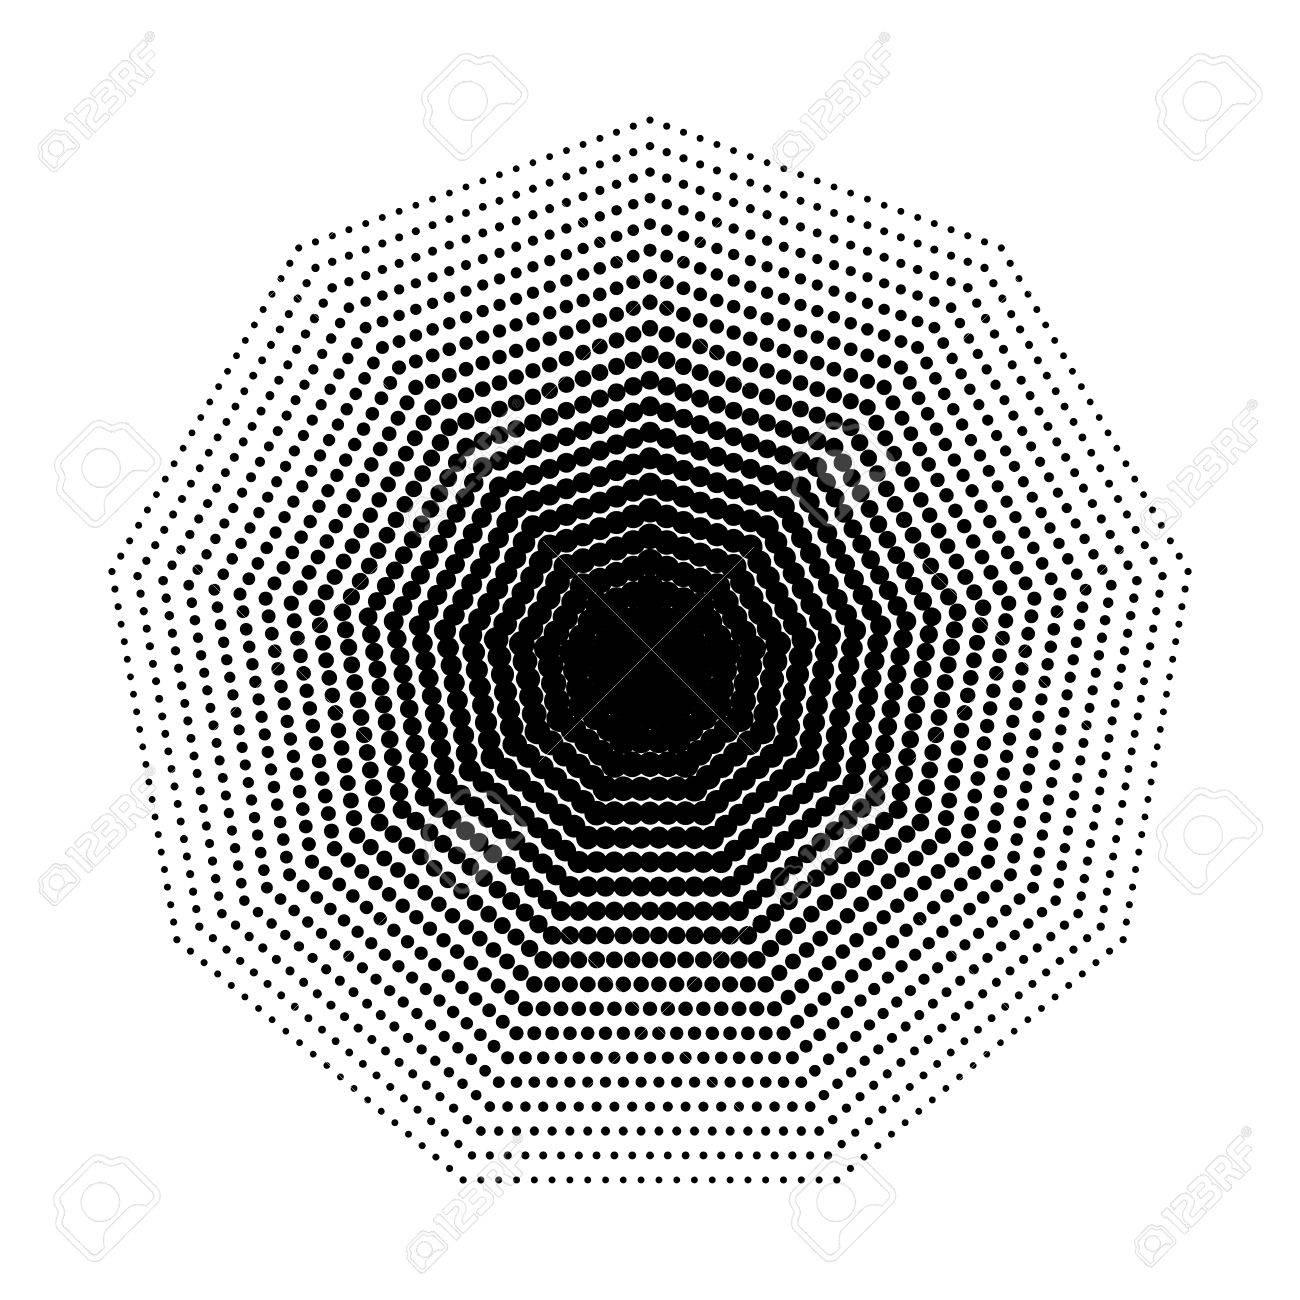 vector nonagon halftone geometric shapes, dot design abstractvector vector nonagon halftone geometric shapes, dot design abstract background the geometric shape with nine angles, basic shapes